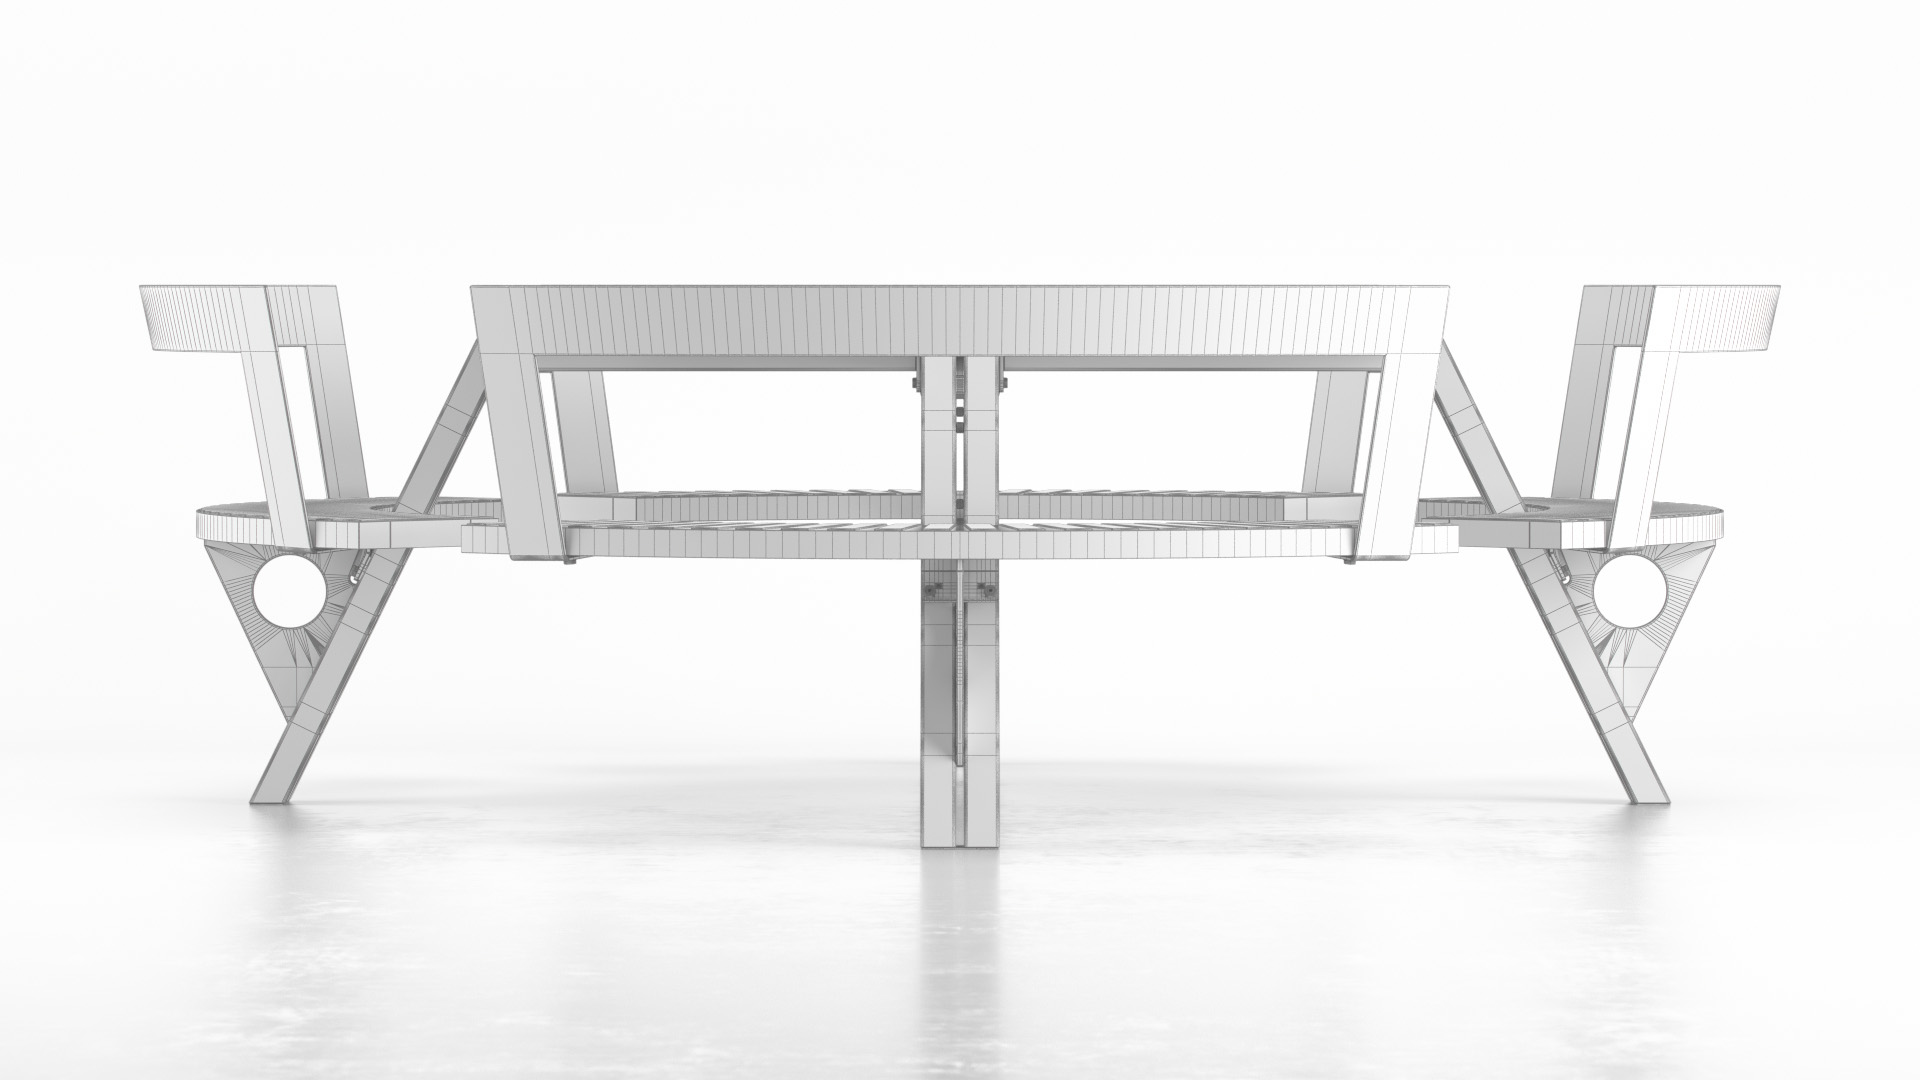 Gargantua_Table_Mode3_WhiteSet_01_wire_0001